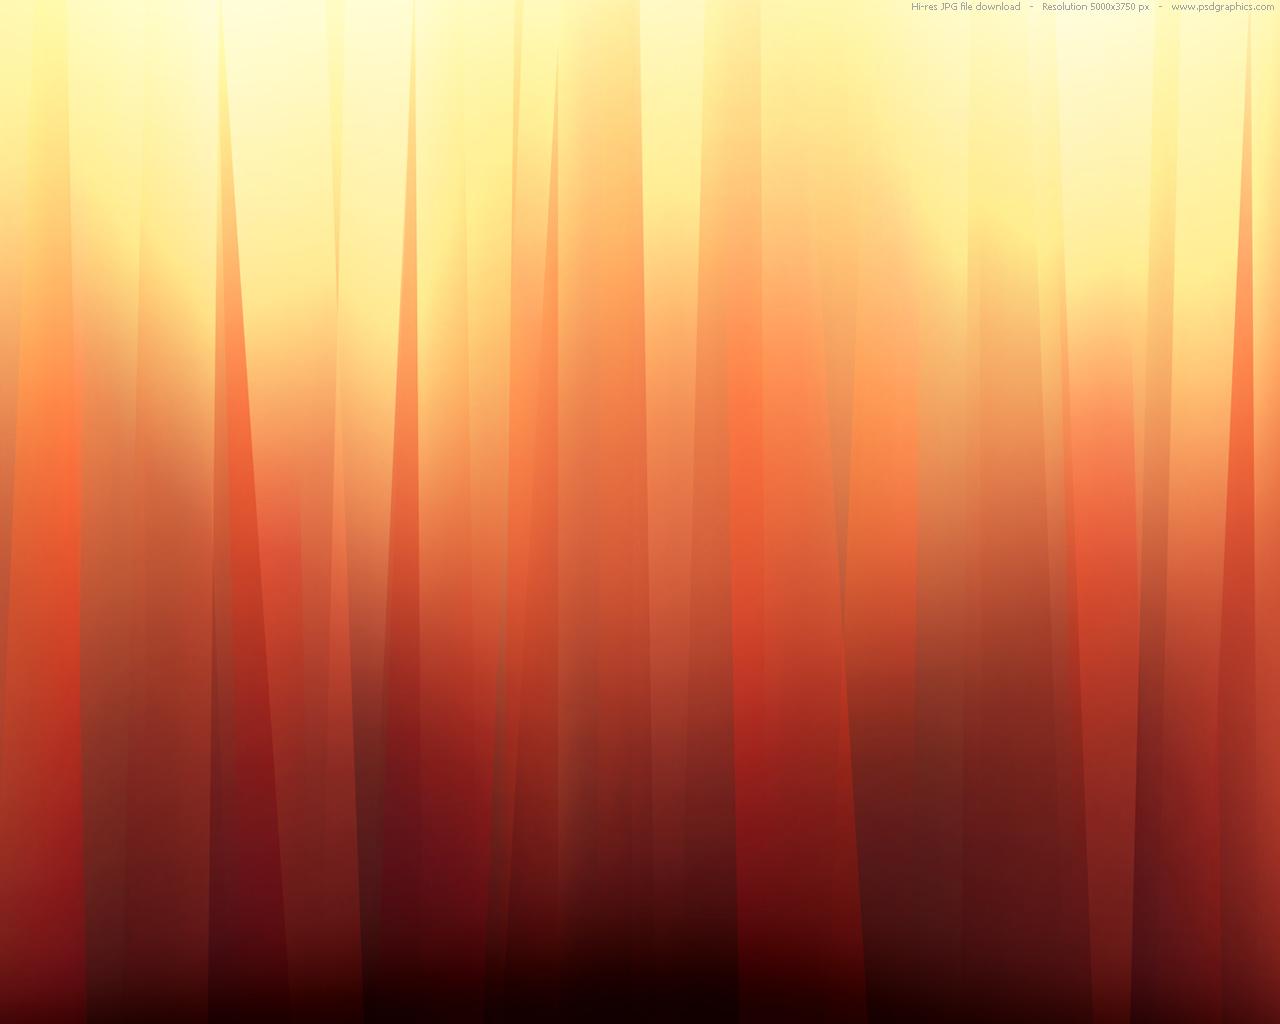 30 High Resolution Photoshop Textures Background Kitaro10 1280x1024